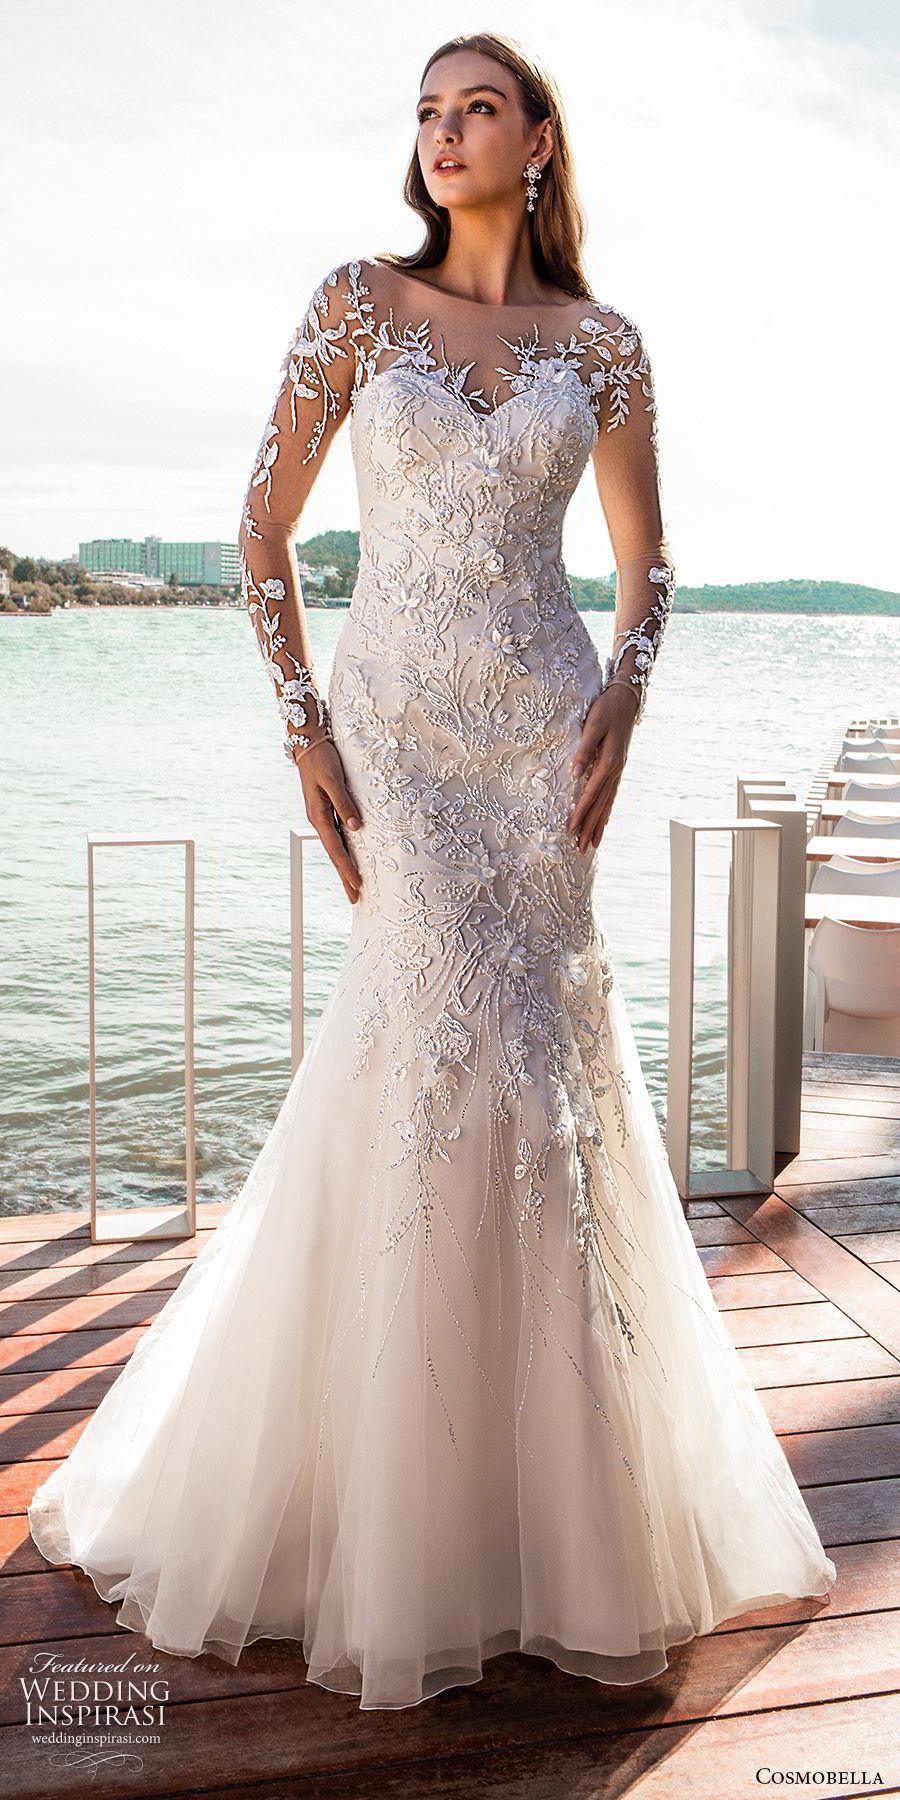 cosmobella 2020 bridal illusion long sleeves sheer bateau neck sweetheart fully embellished fit flare mermaid wedding dress (12) glitzy glam chapel train mv